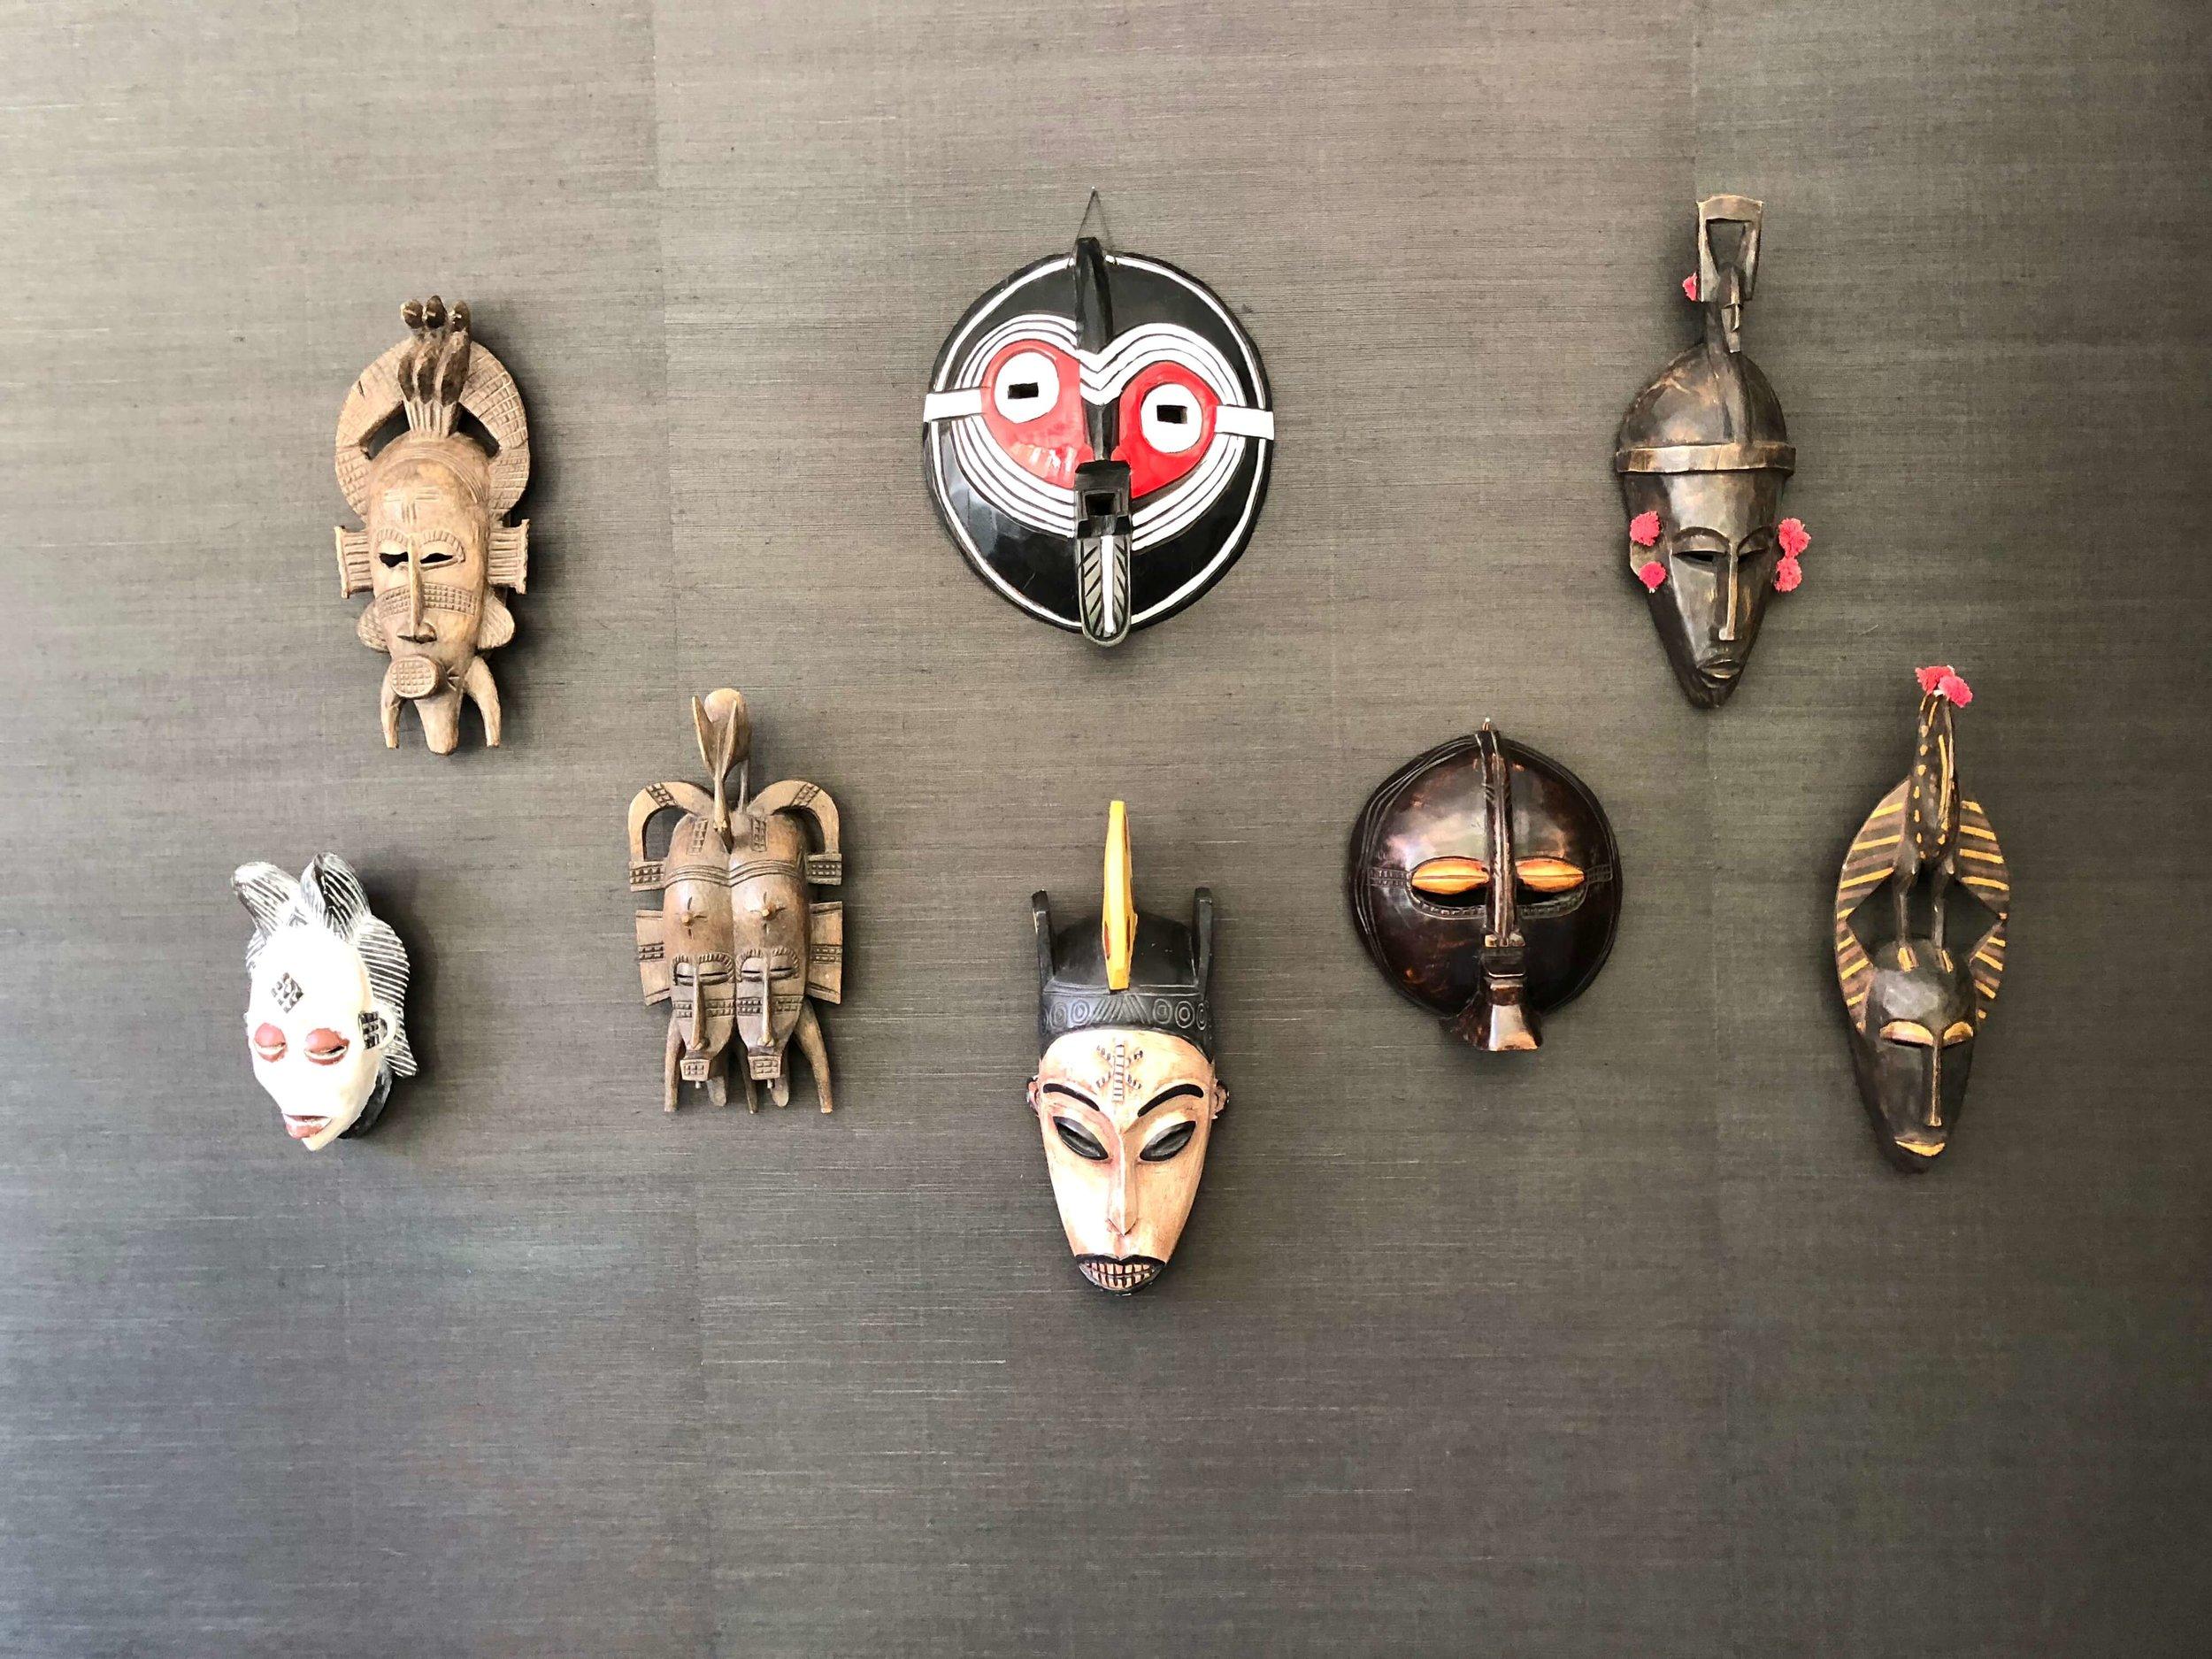 Global style in the Traveler's Room with masks on grasscloth walls, Designer: Parker West Interiors, Pasadena Showcase House of Design #masks #globalstyle #grasscloth